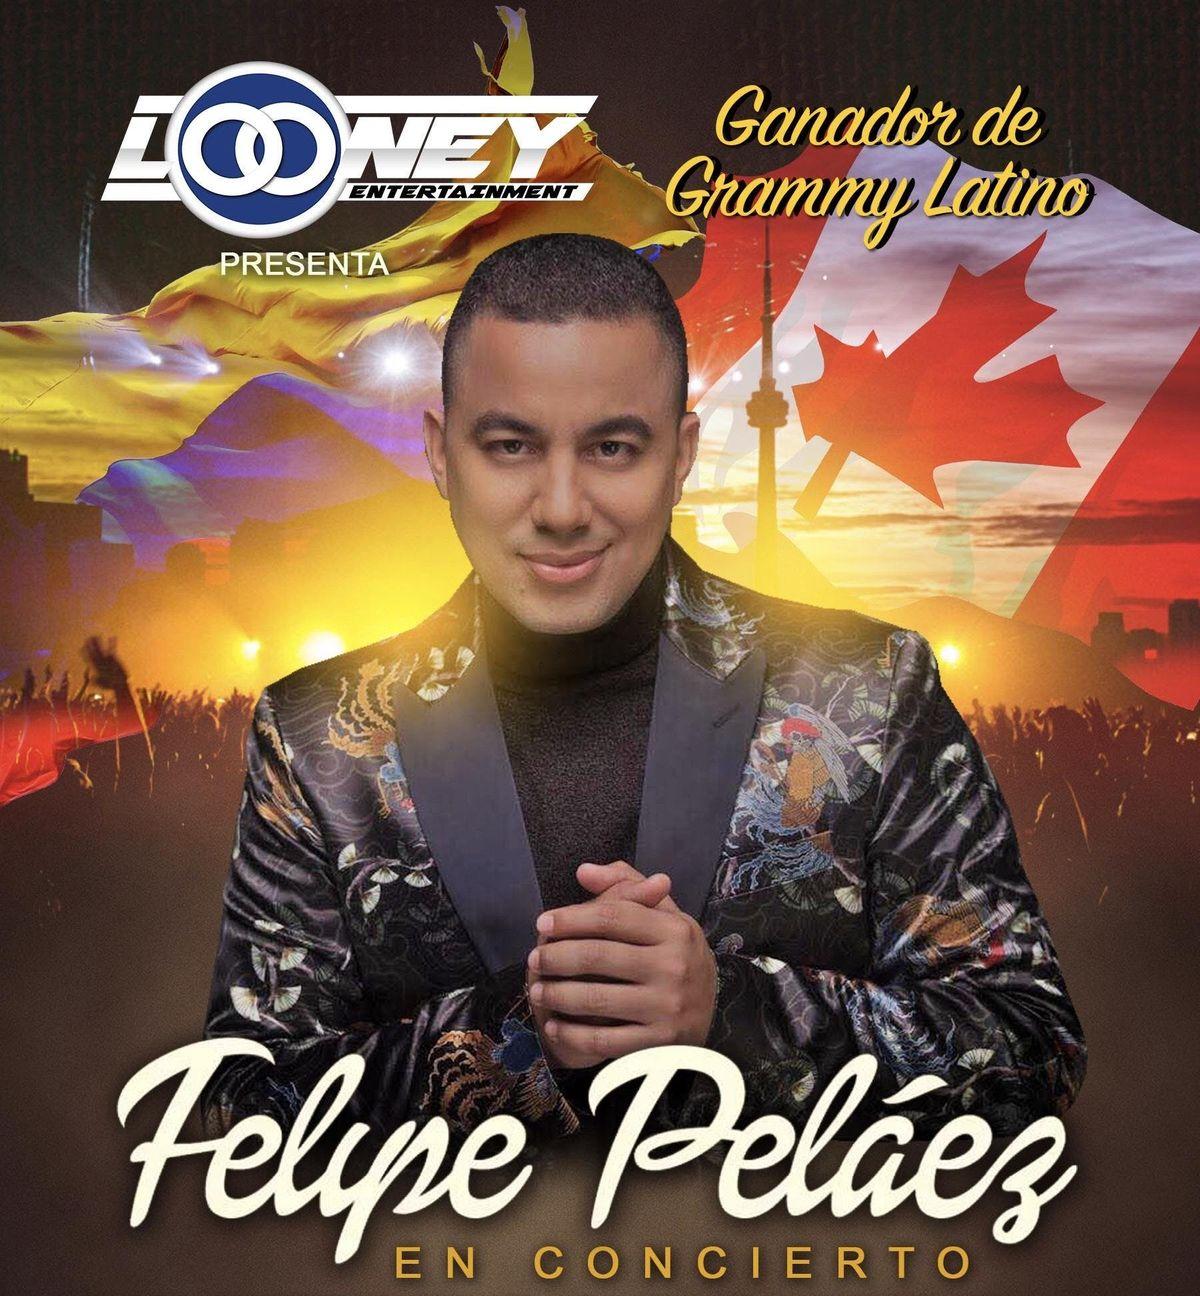 Felipe Pelaez En Toronto Canada at Royal king Banquet Hall